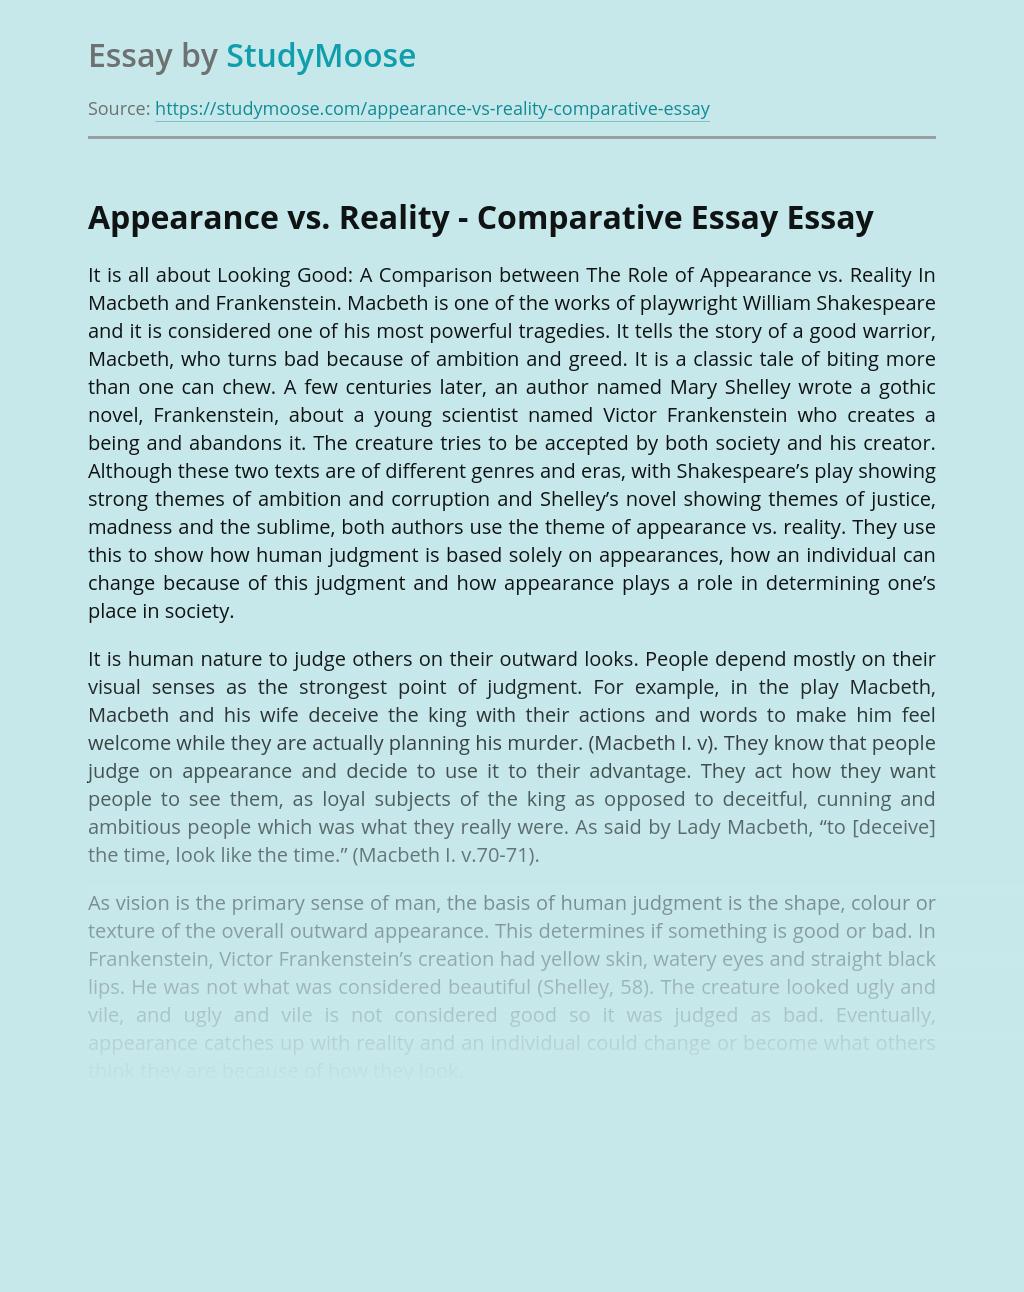 Appearance vs. Reality - Comparative Essay